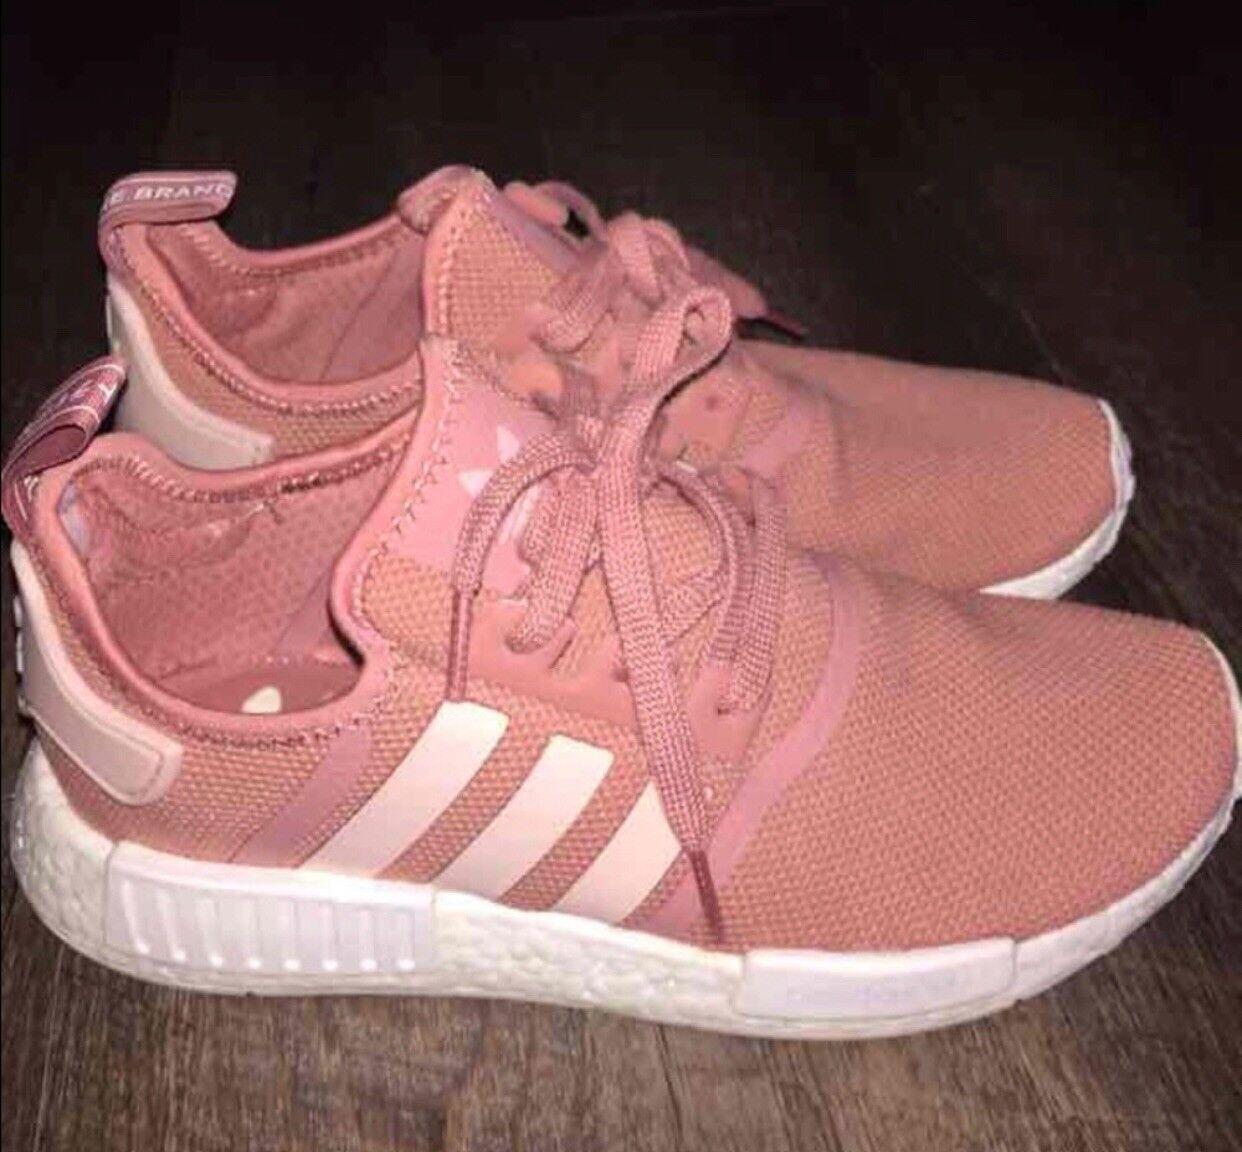 Adidas nmd r1 r1 r1 raw - pink fb6b34